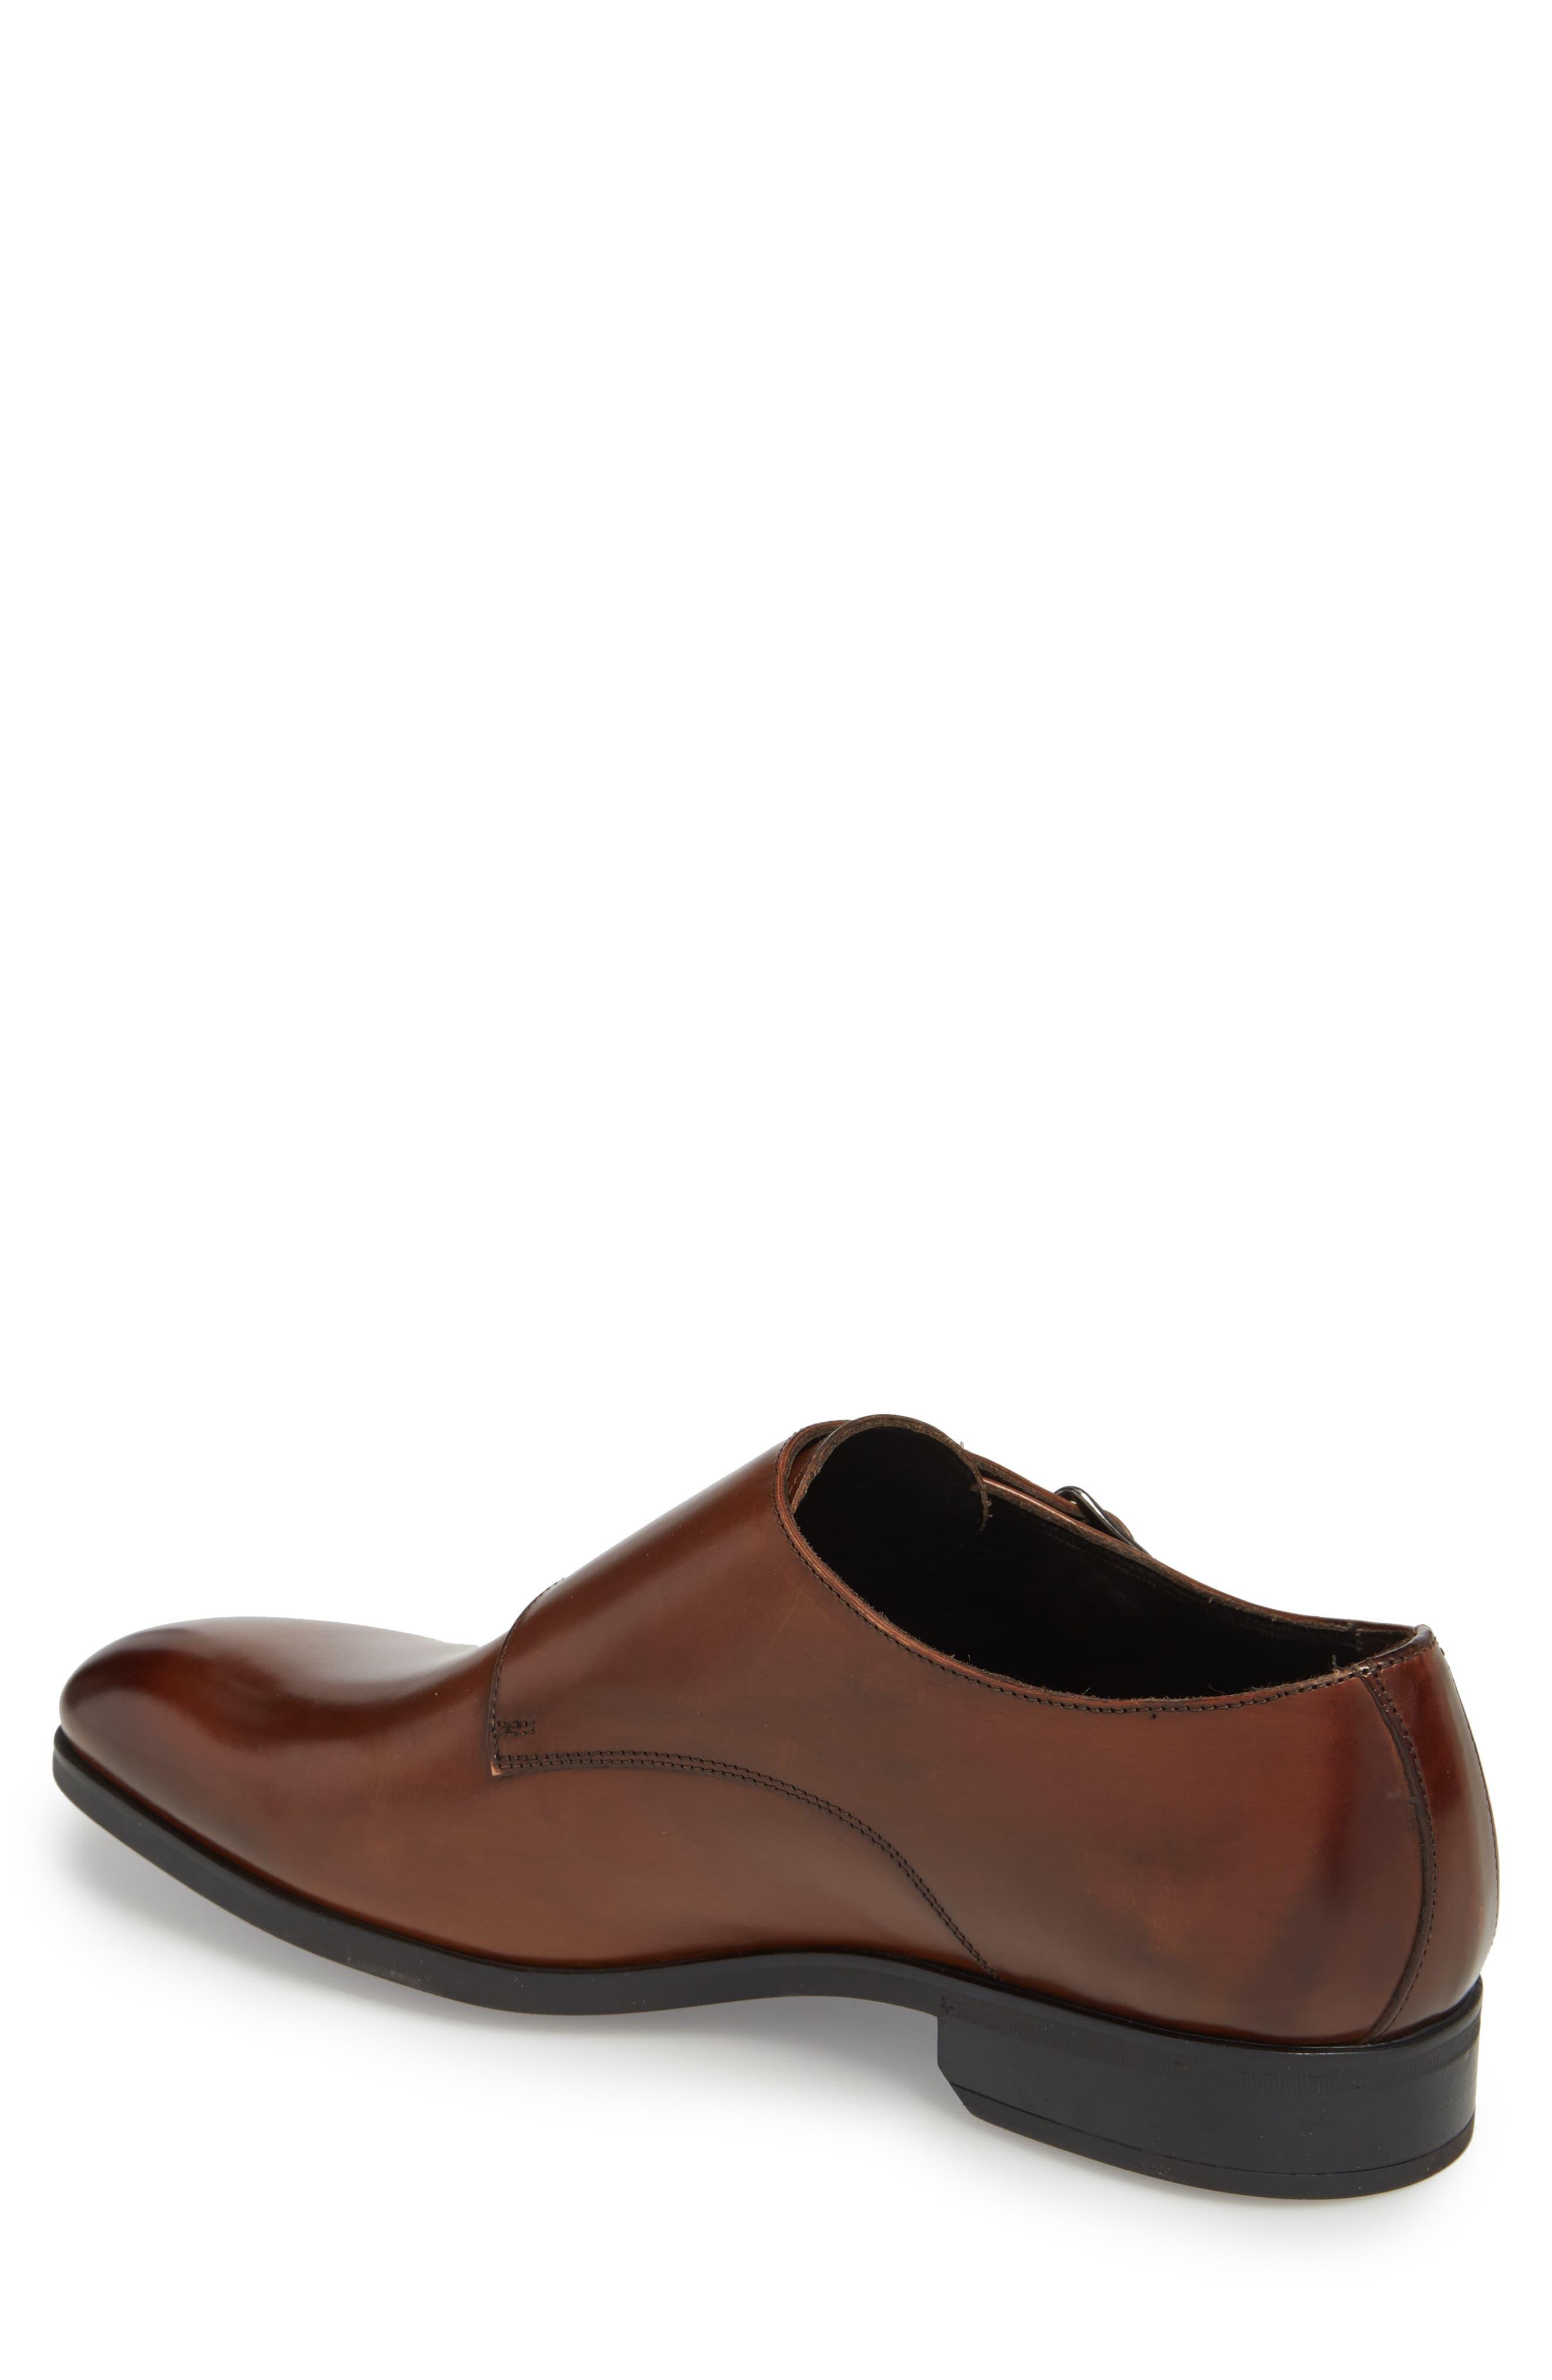 Benjamin Double Monk Strap Shoe,                             Alternate thumbnail 2, color,                             TMORO LEATHER